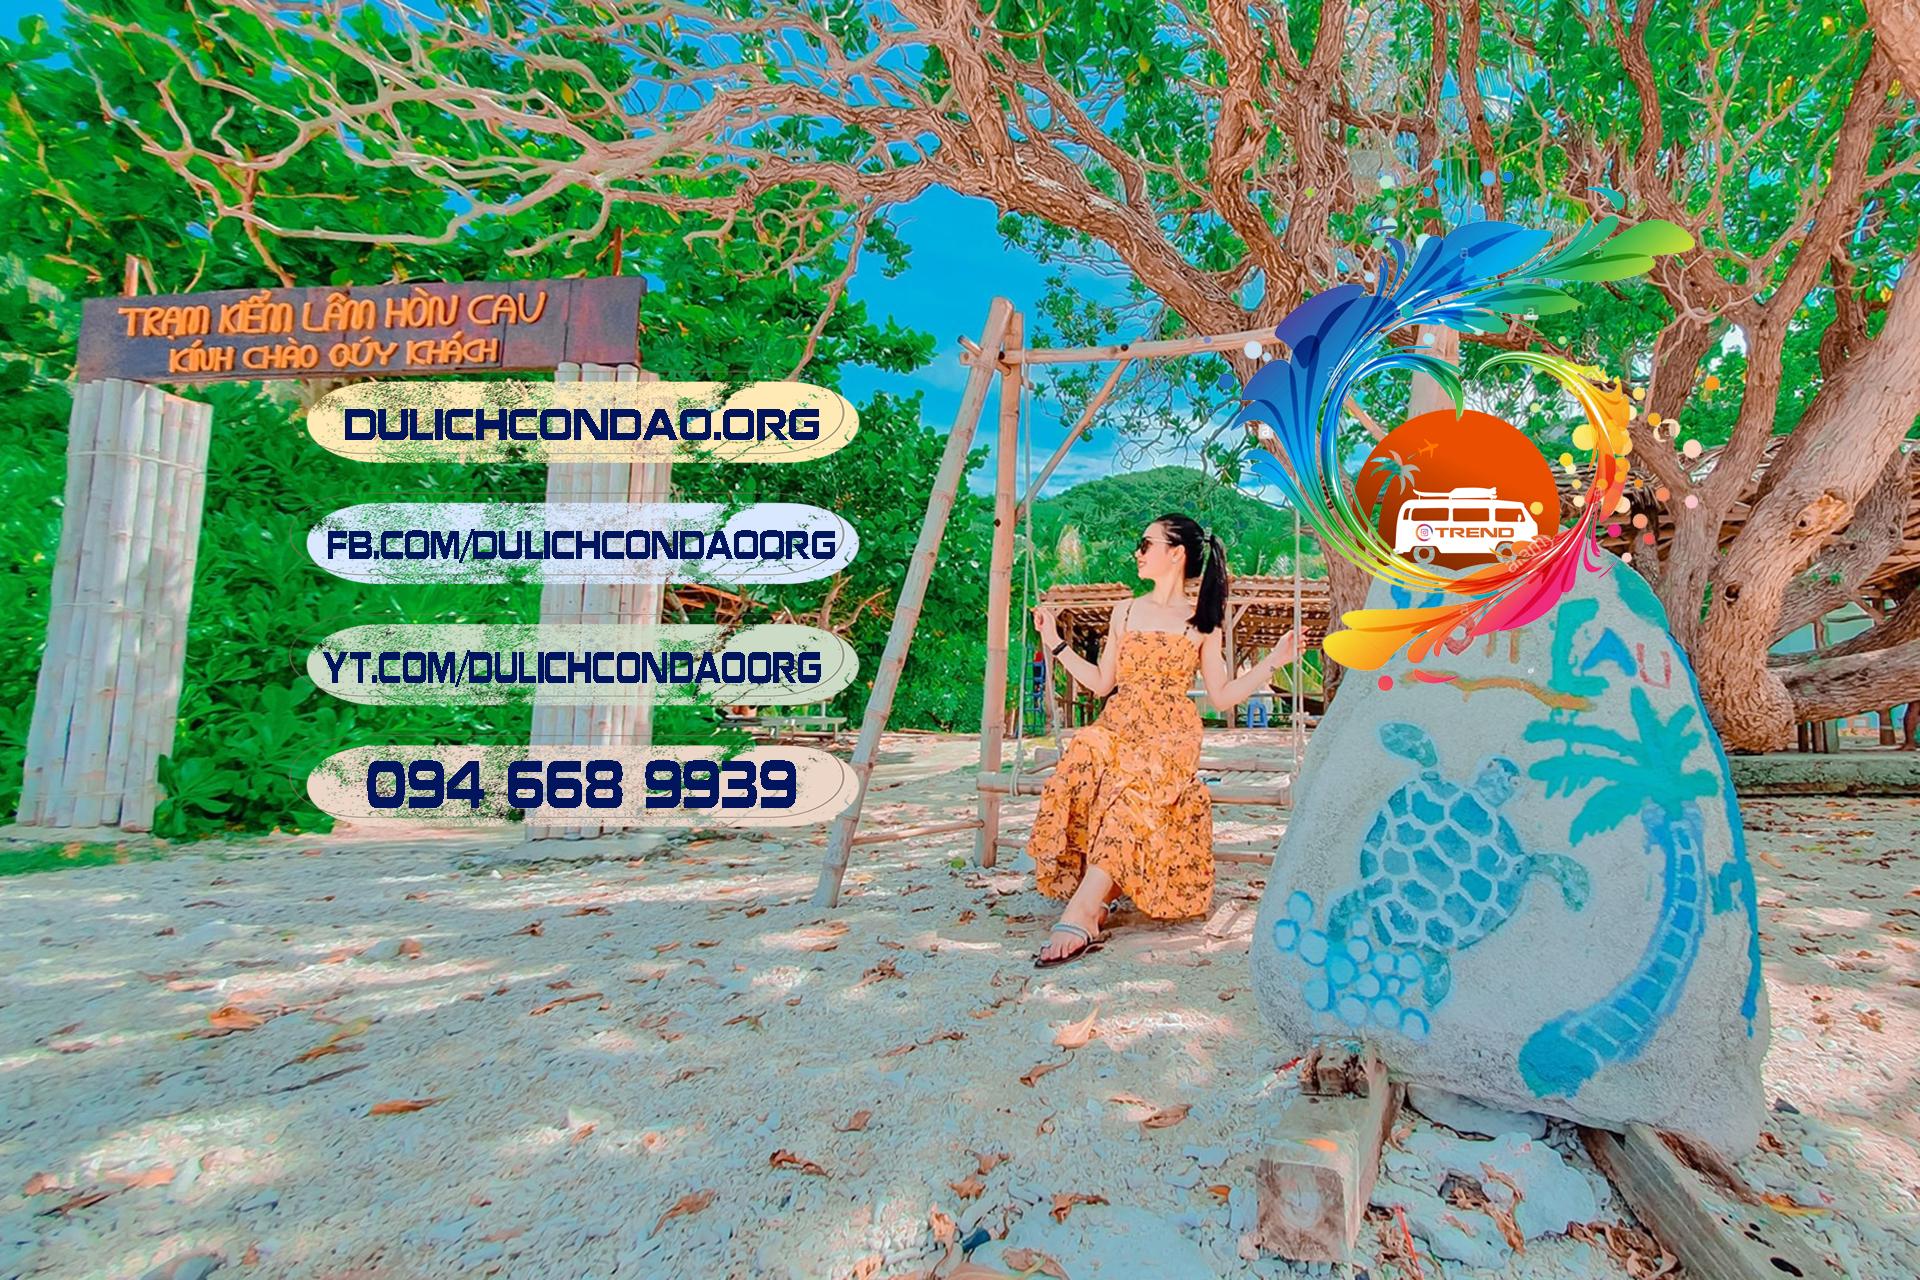 dulicondao.org-island-con-dao-group